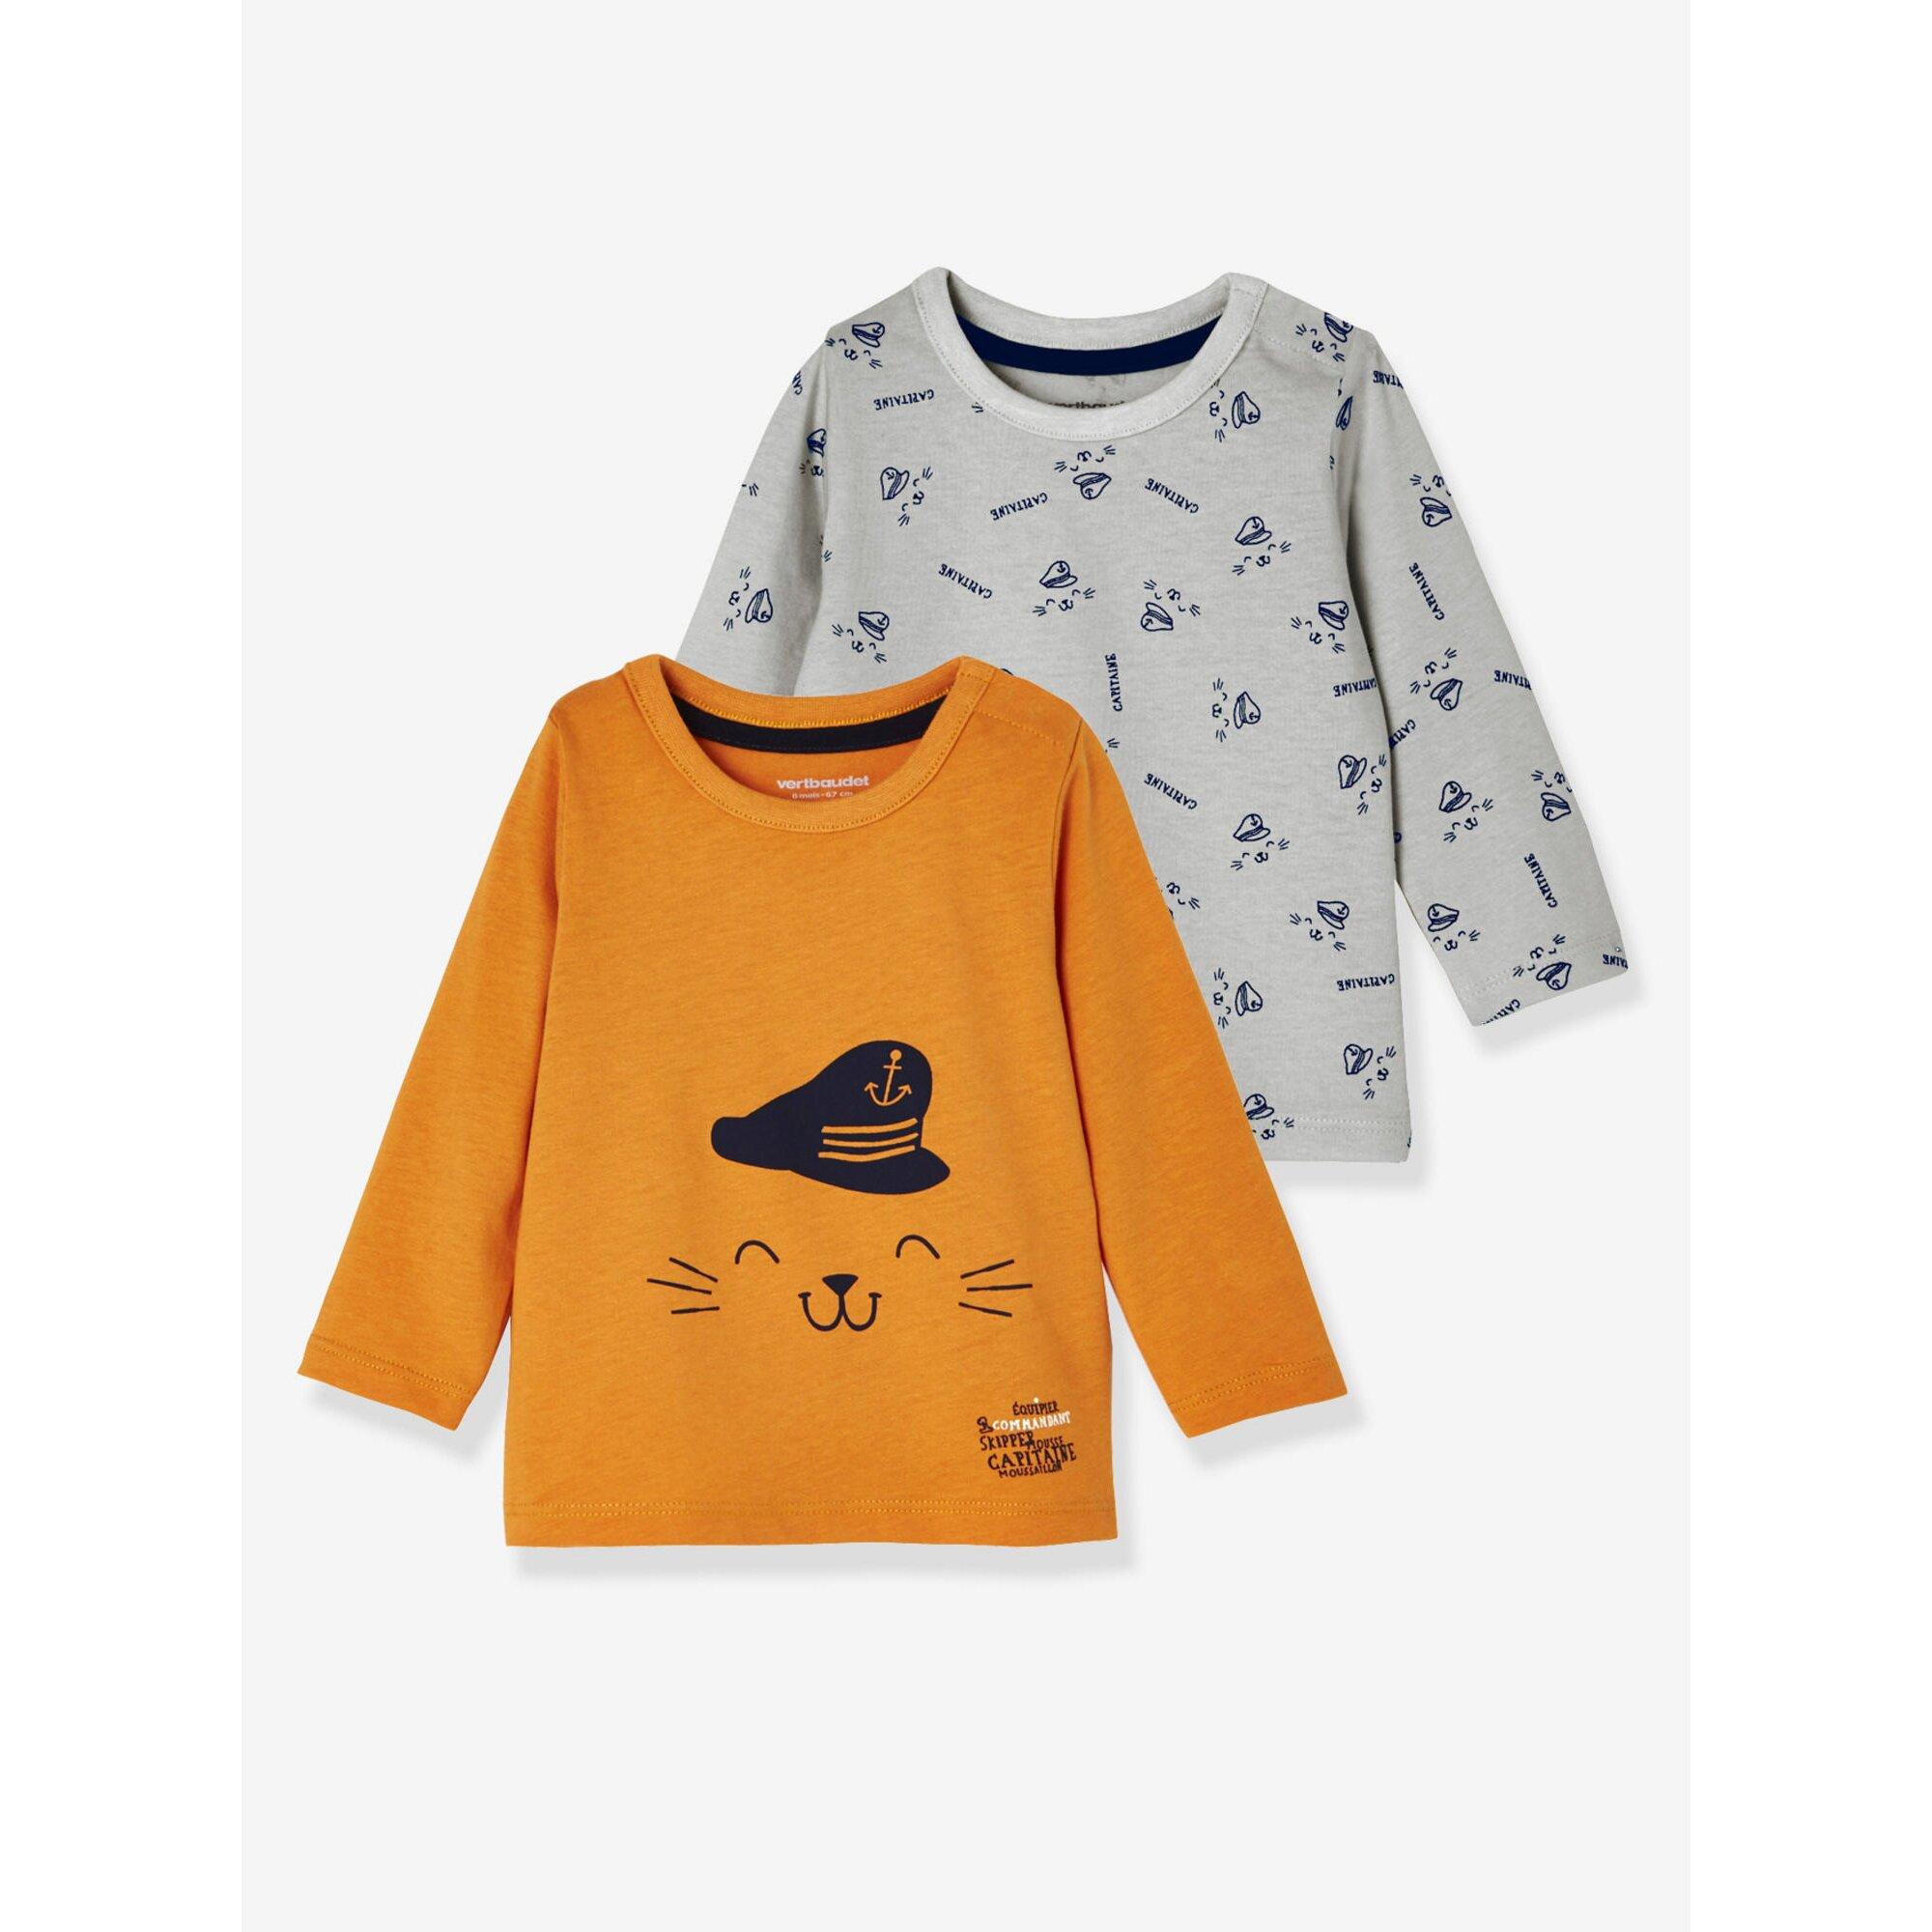 vertbaudet-2er-pack-print-shirts-fur-baby-jungen